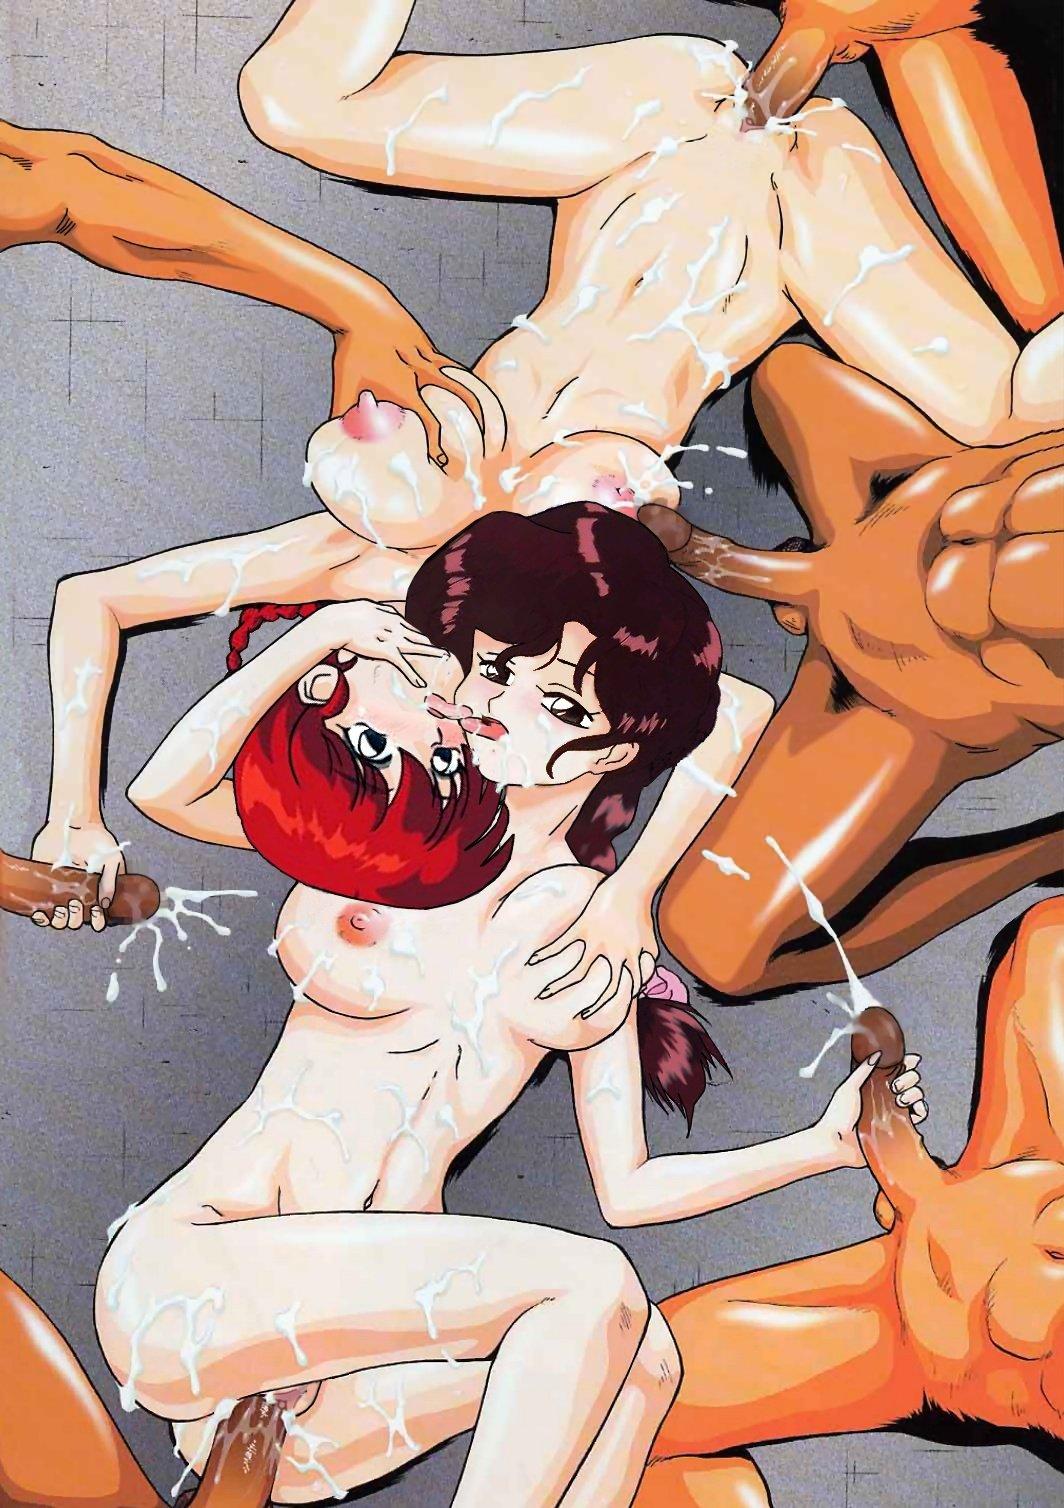 ranma nudity 1/2 How old is jules fortnite